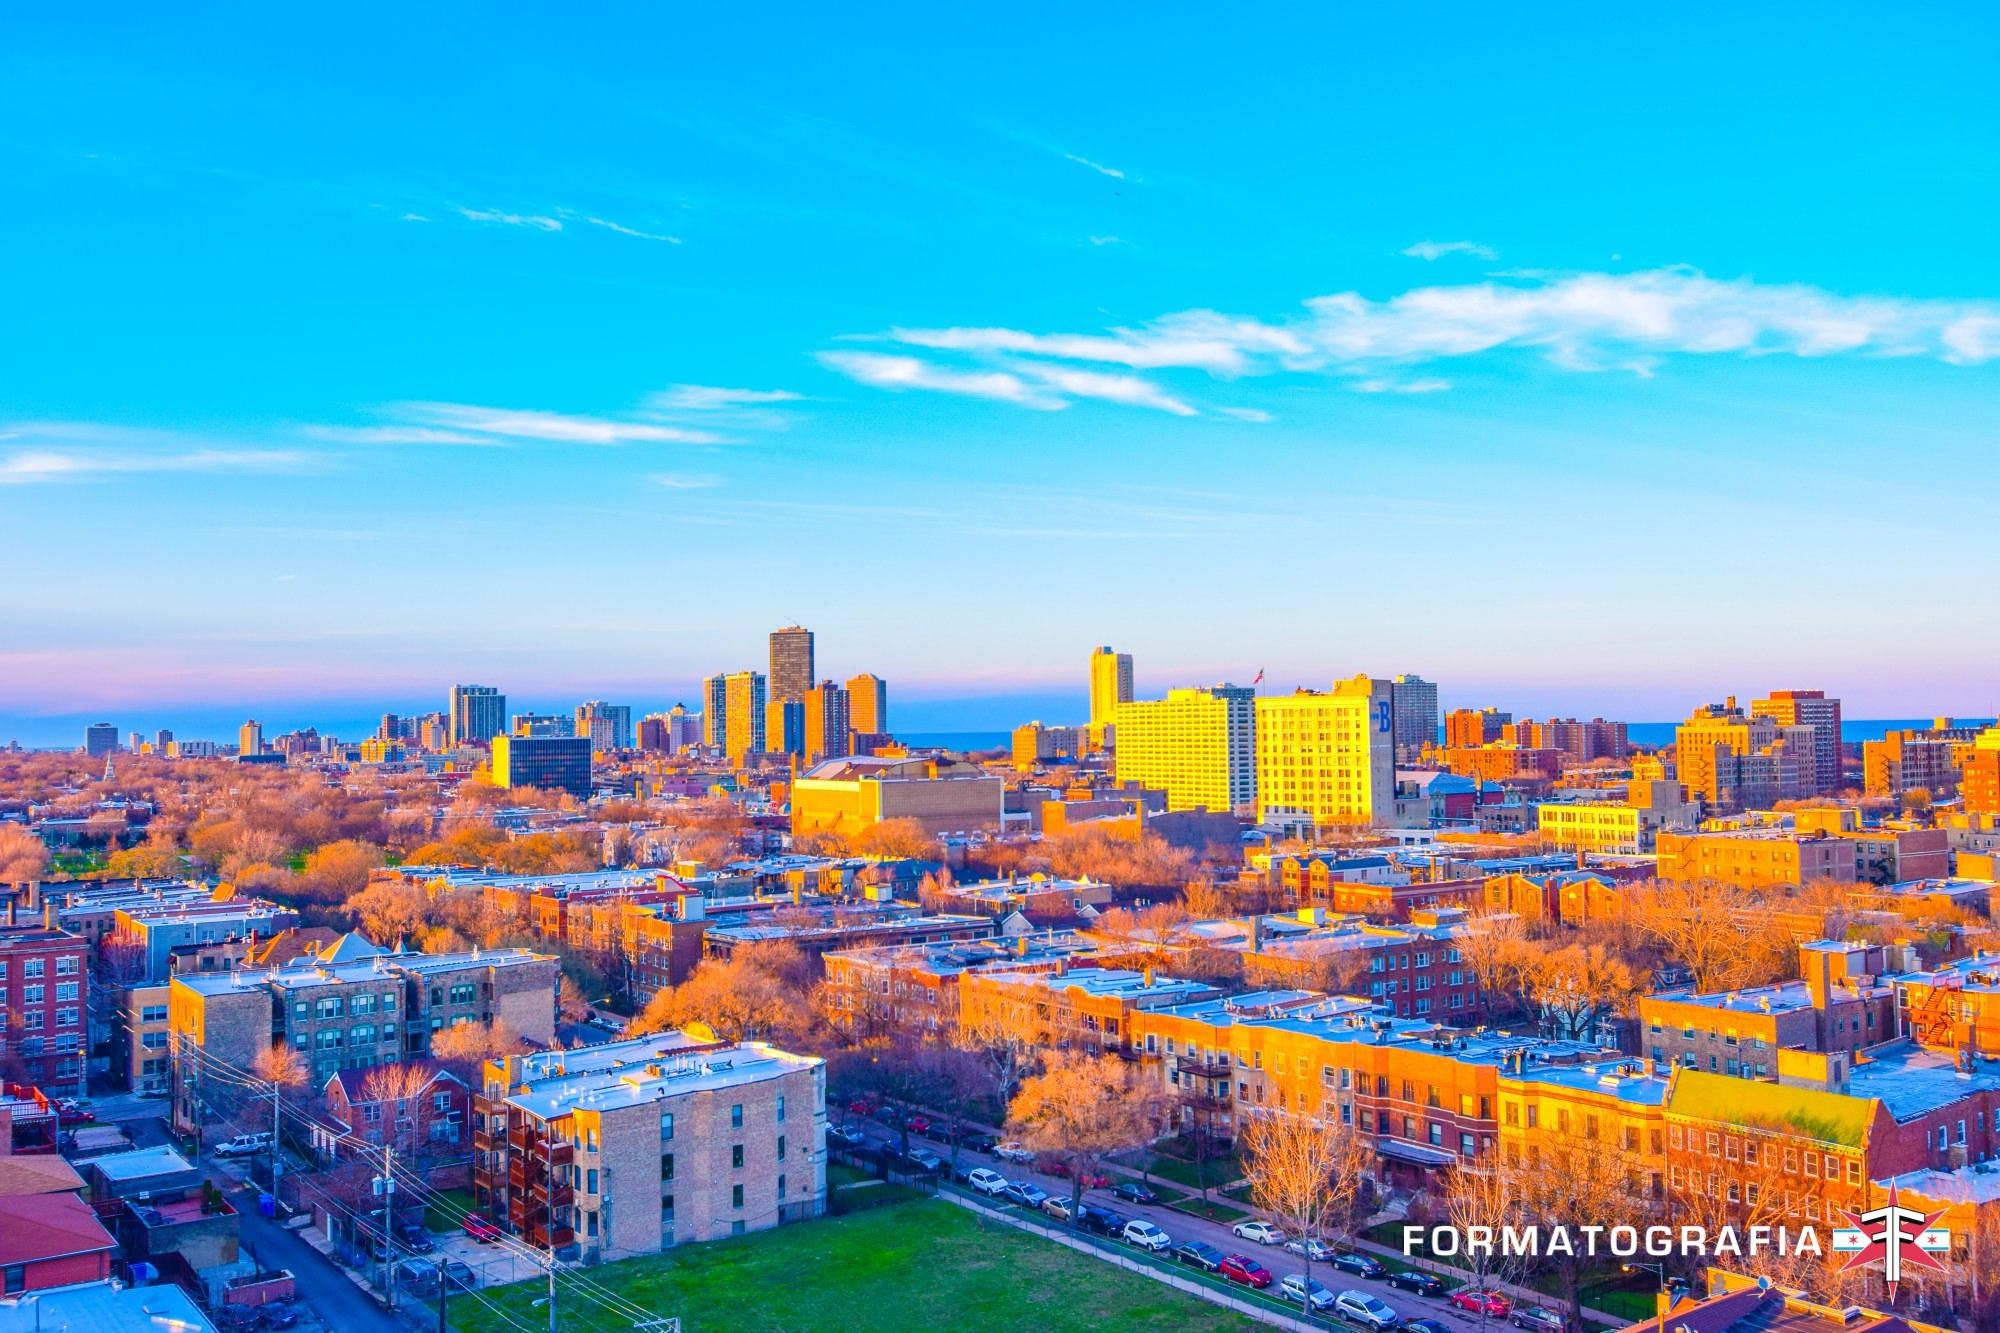 eric formato chicago photographer fall update city architecture shotsDSC_0768.jpg